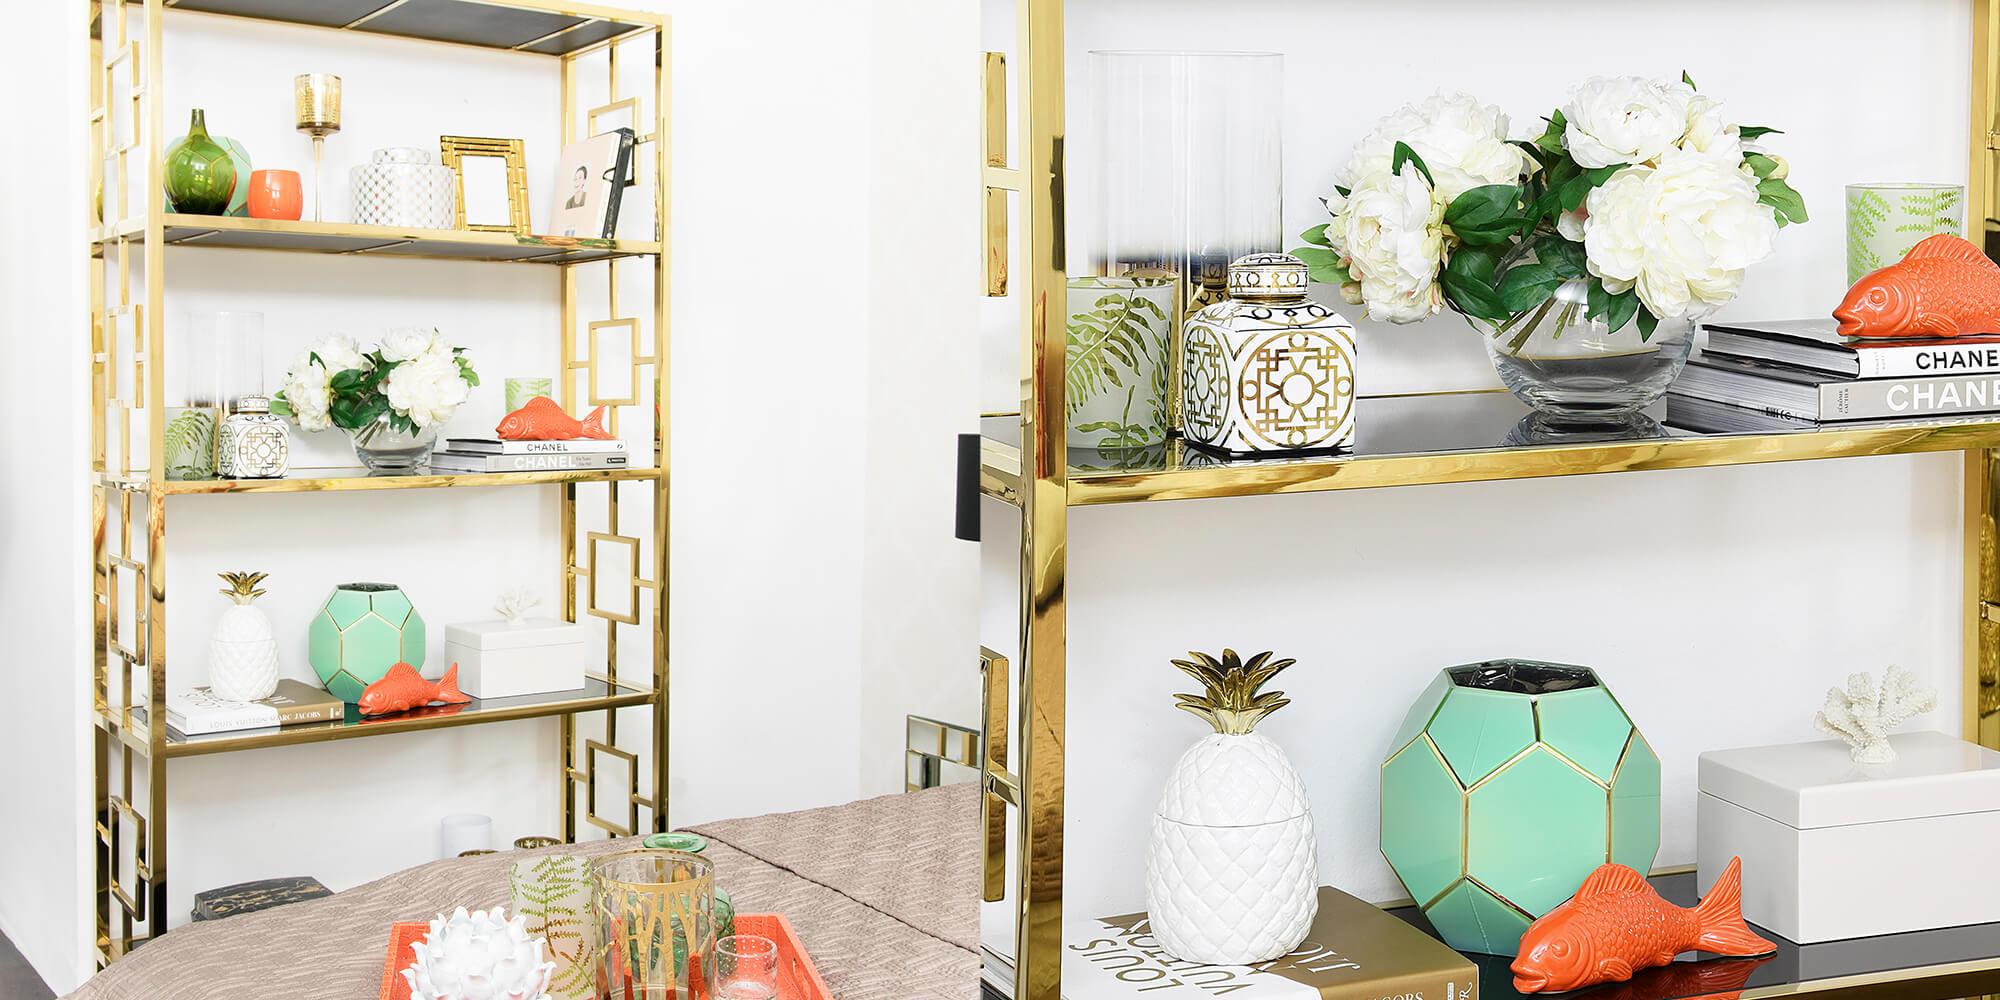 Let's get retro! Bücherregal im Art-Deco-Stil